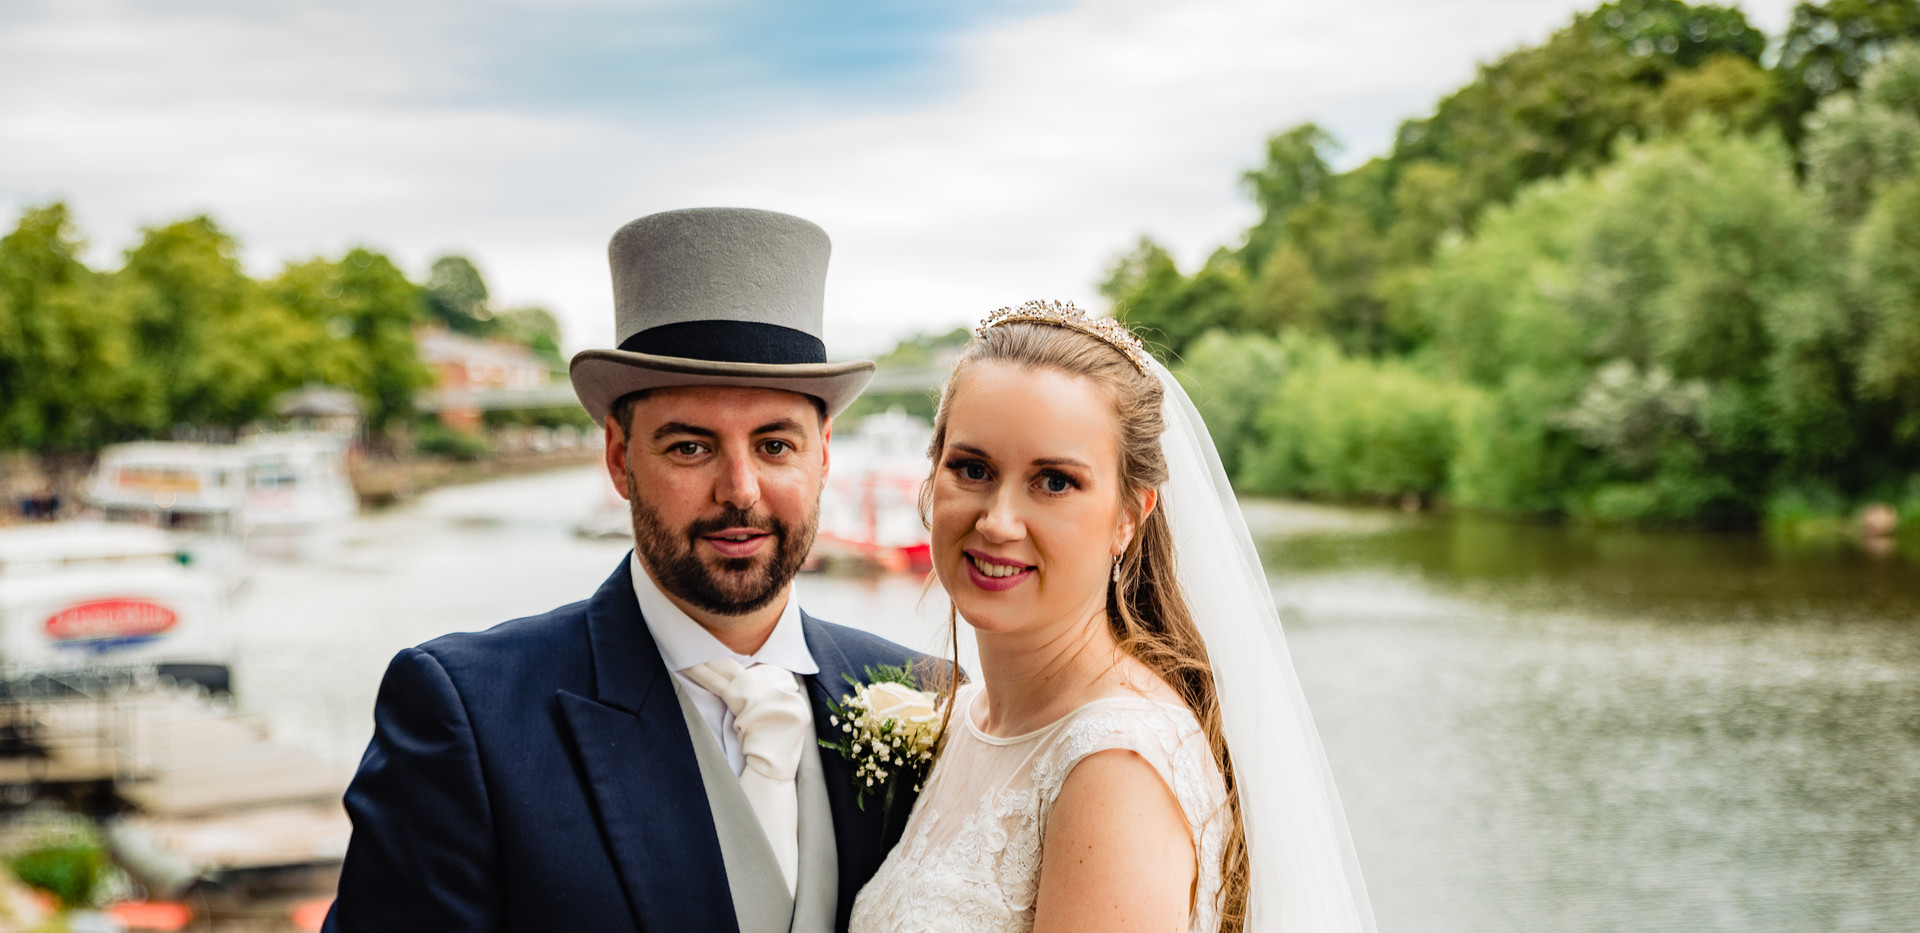 Oddfellows Wedding Photography___29.jpg